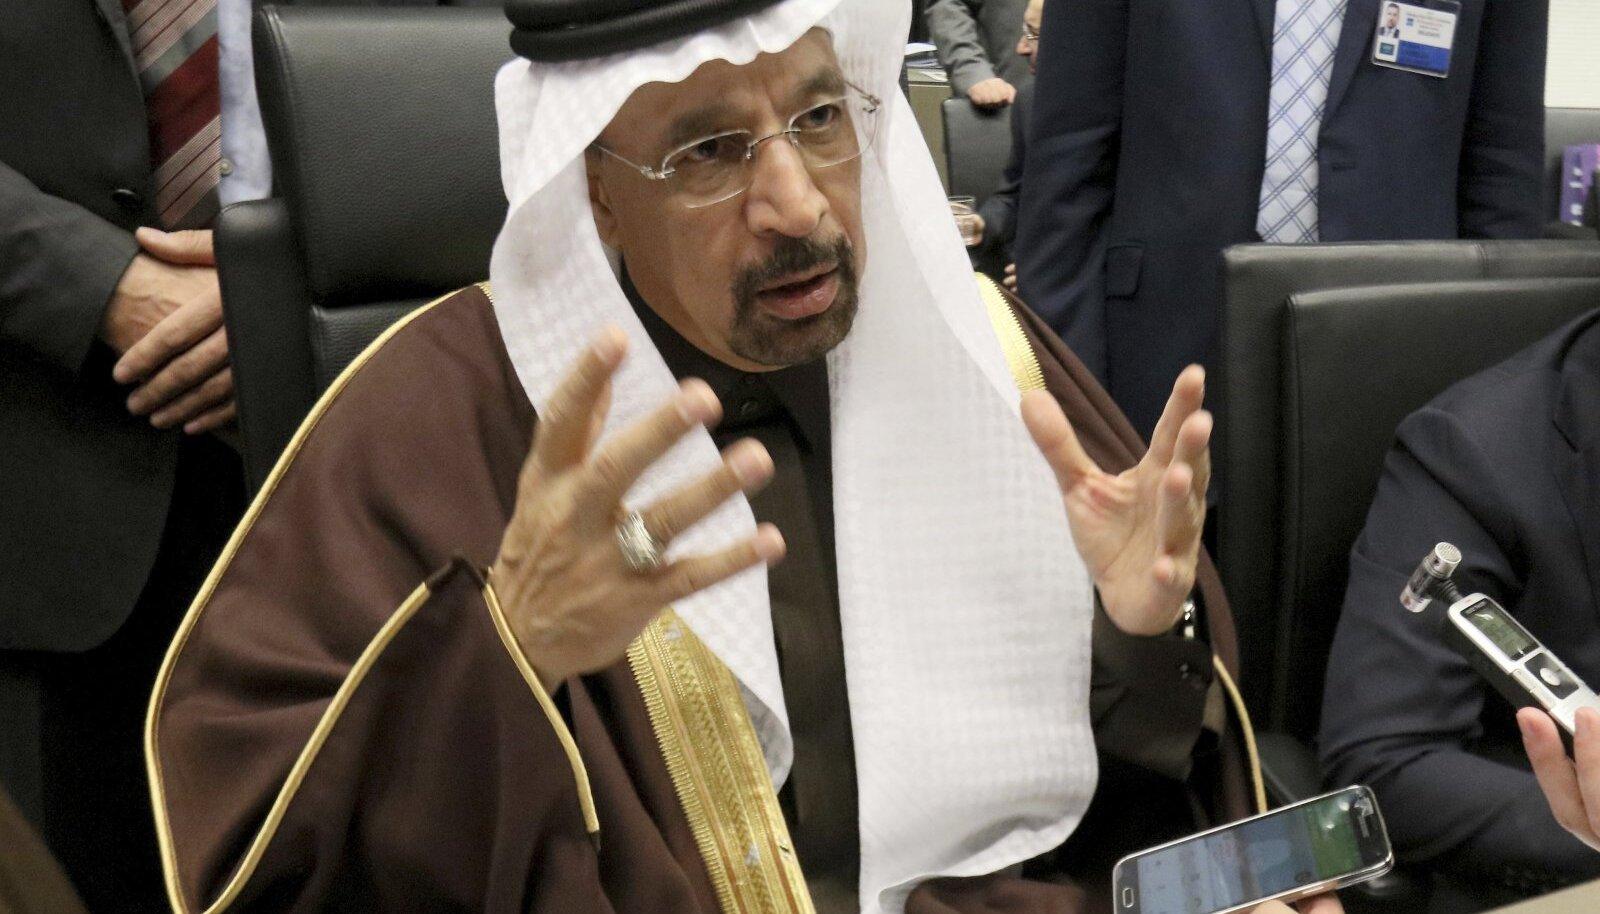 Saudi Araabia energeetikaminister Khaled al-Faleh.